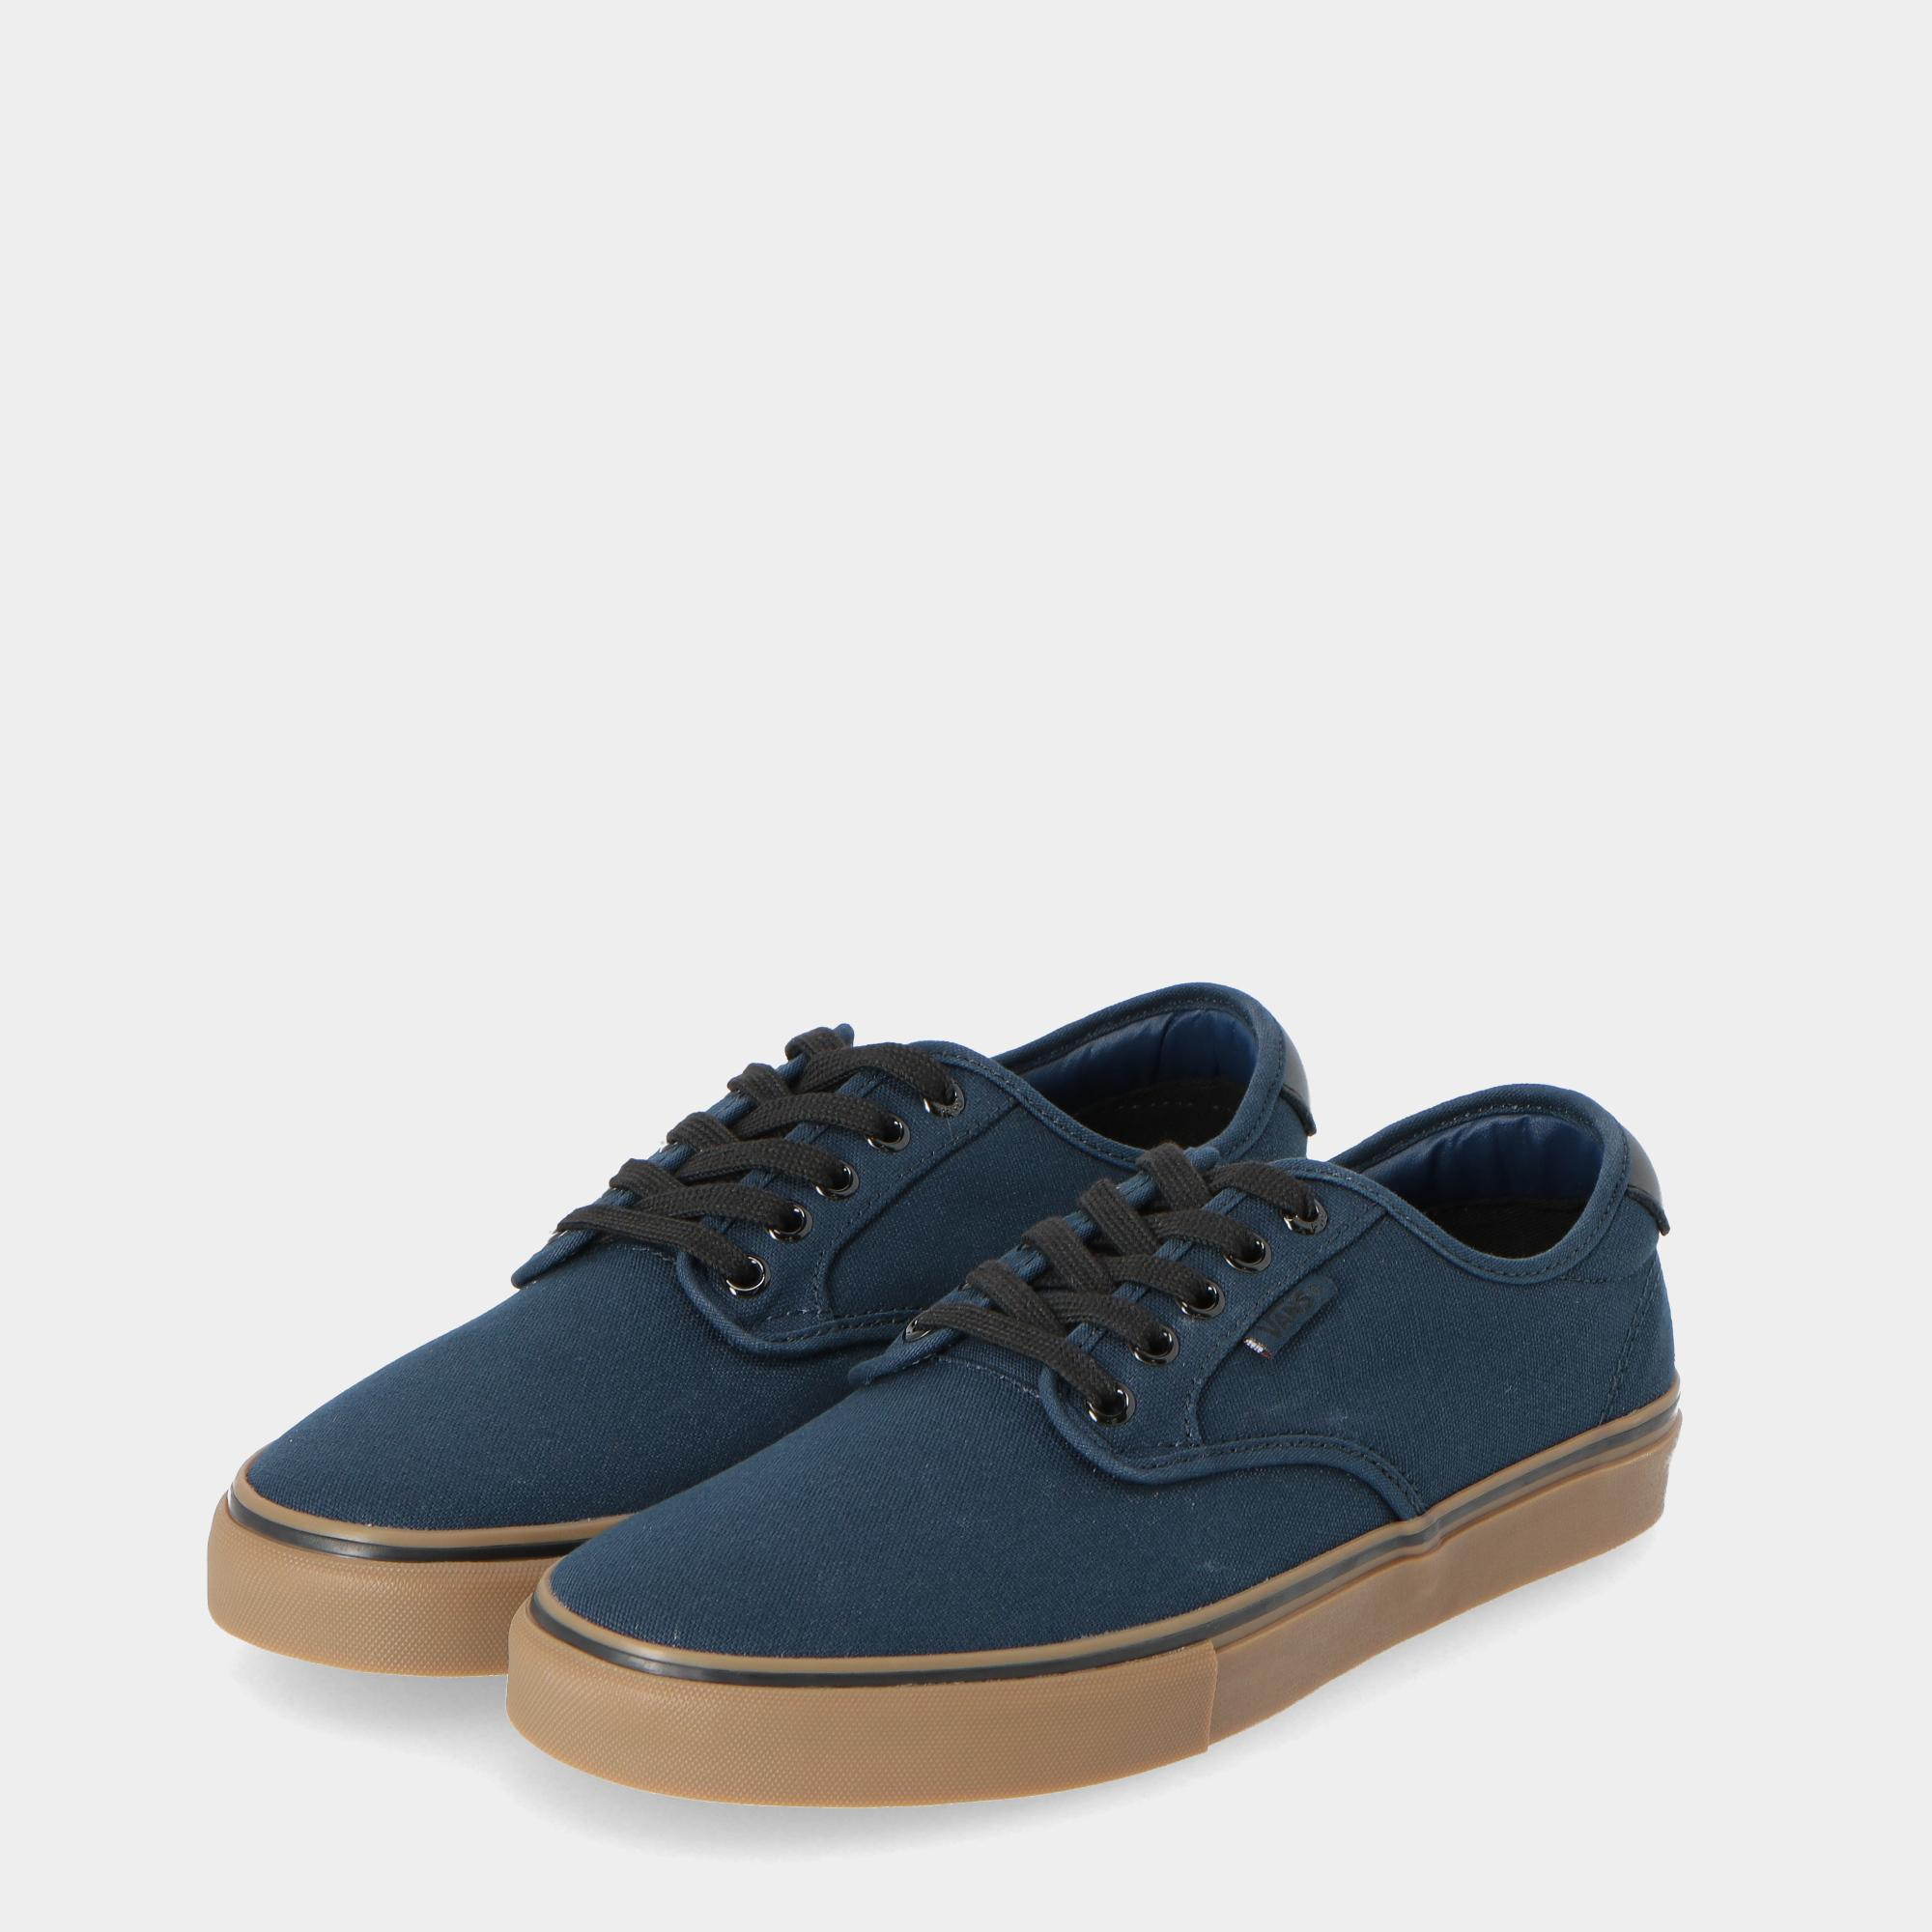 74322d9448ca61 Vans Chima Ferguson Pro Dress Blue